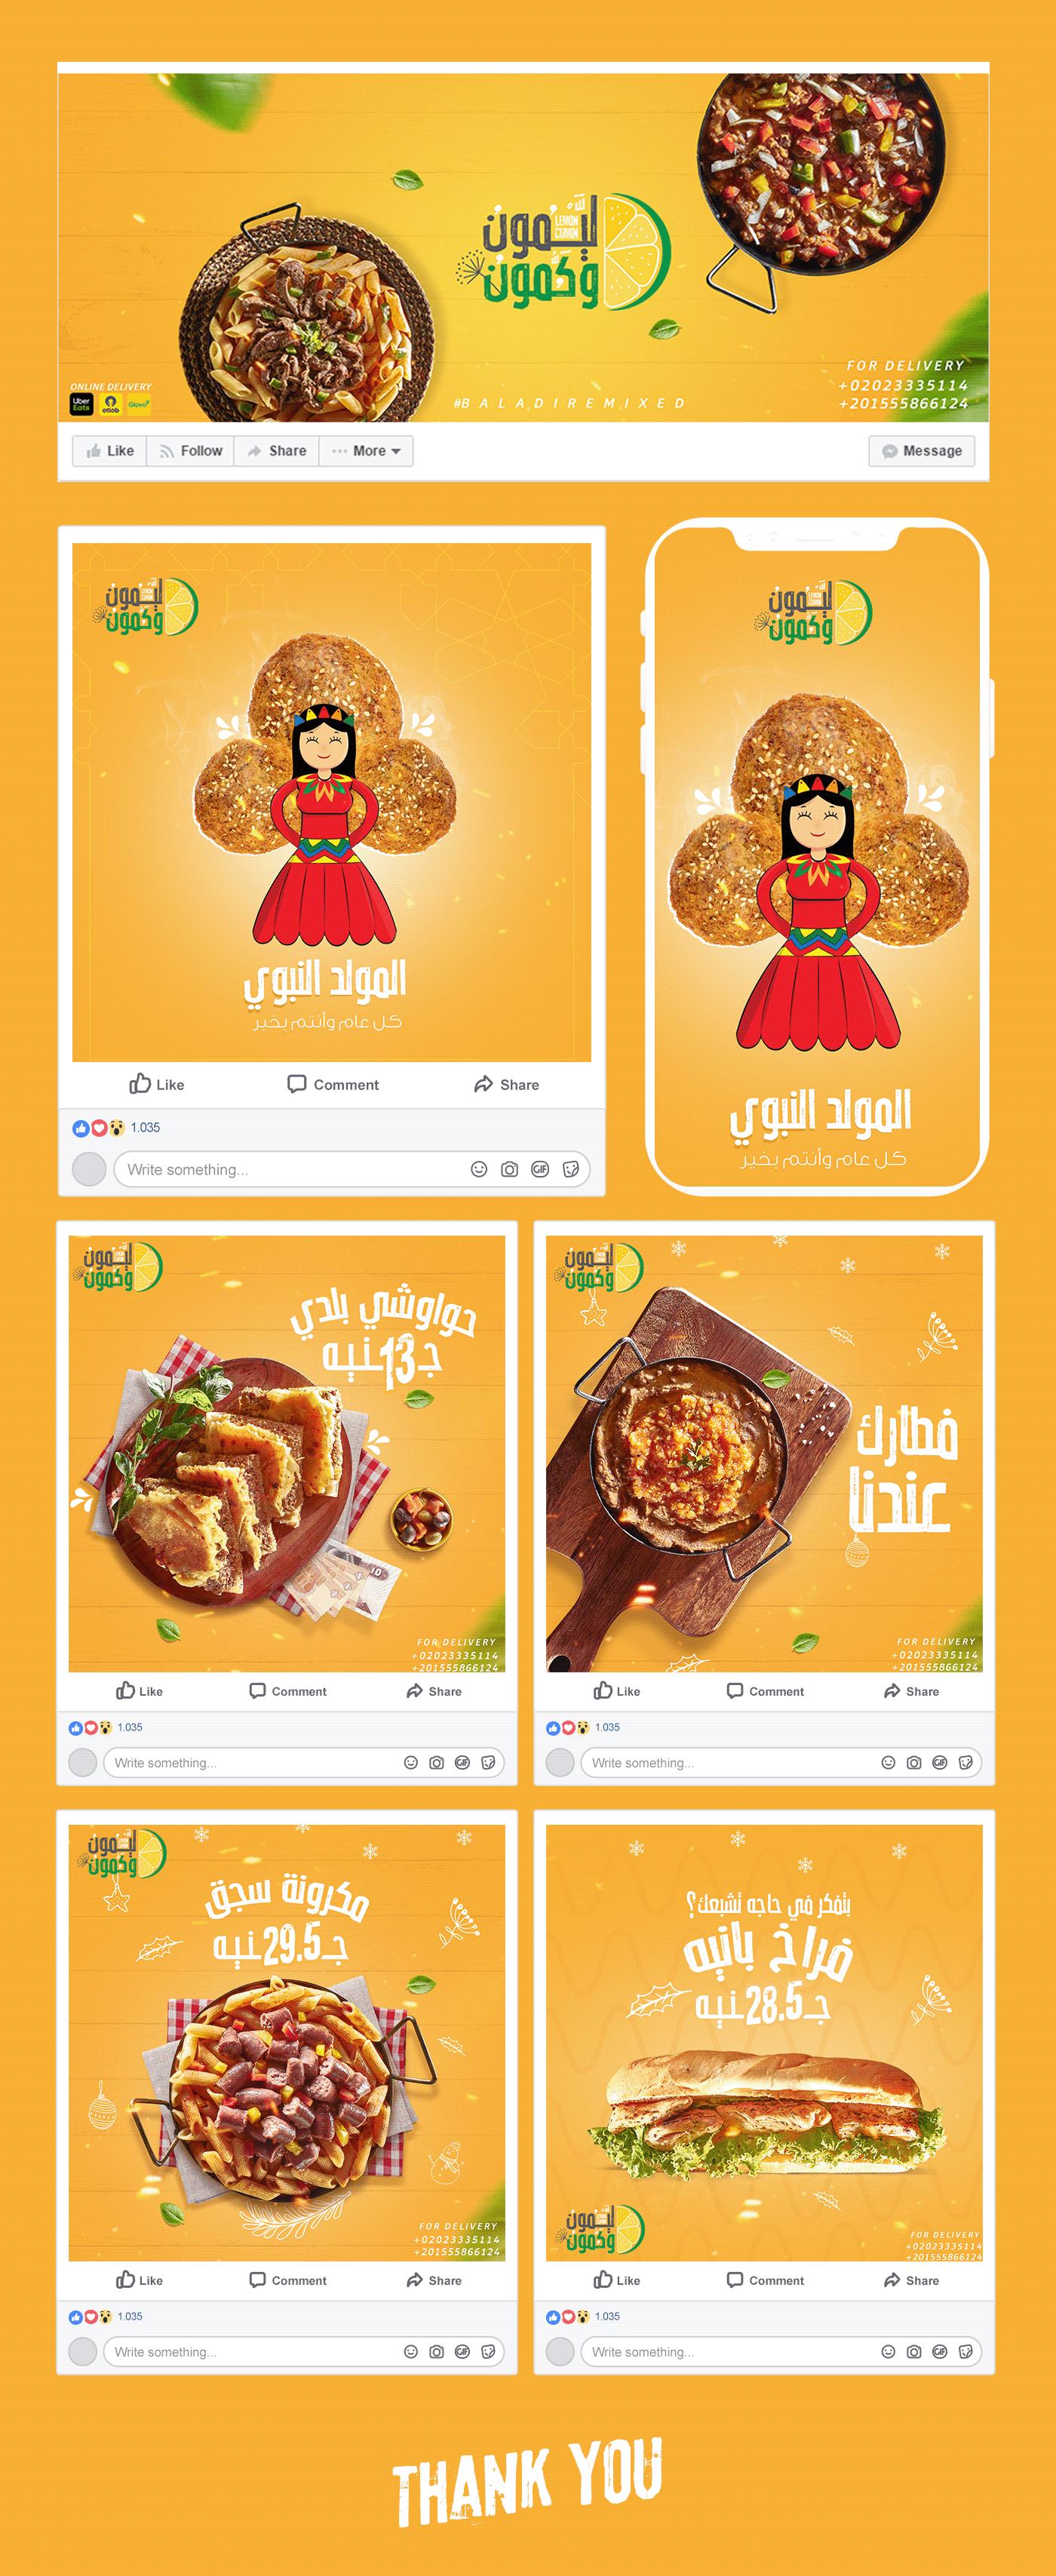 Image may contain: abstract, screenshot and fast food